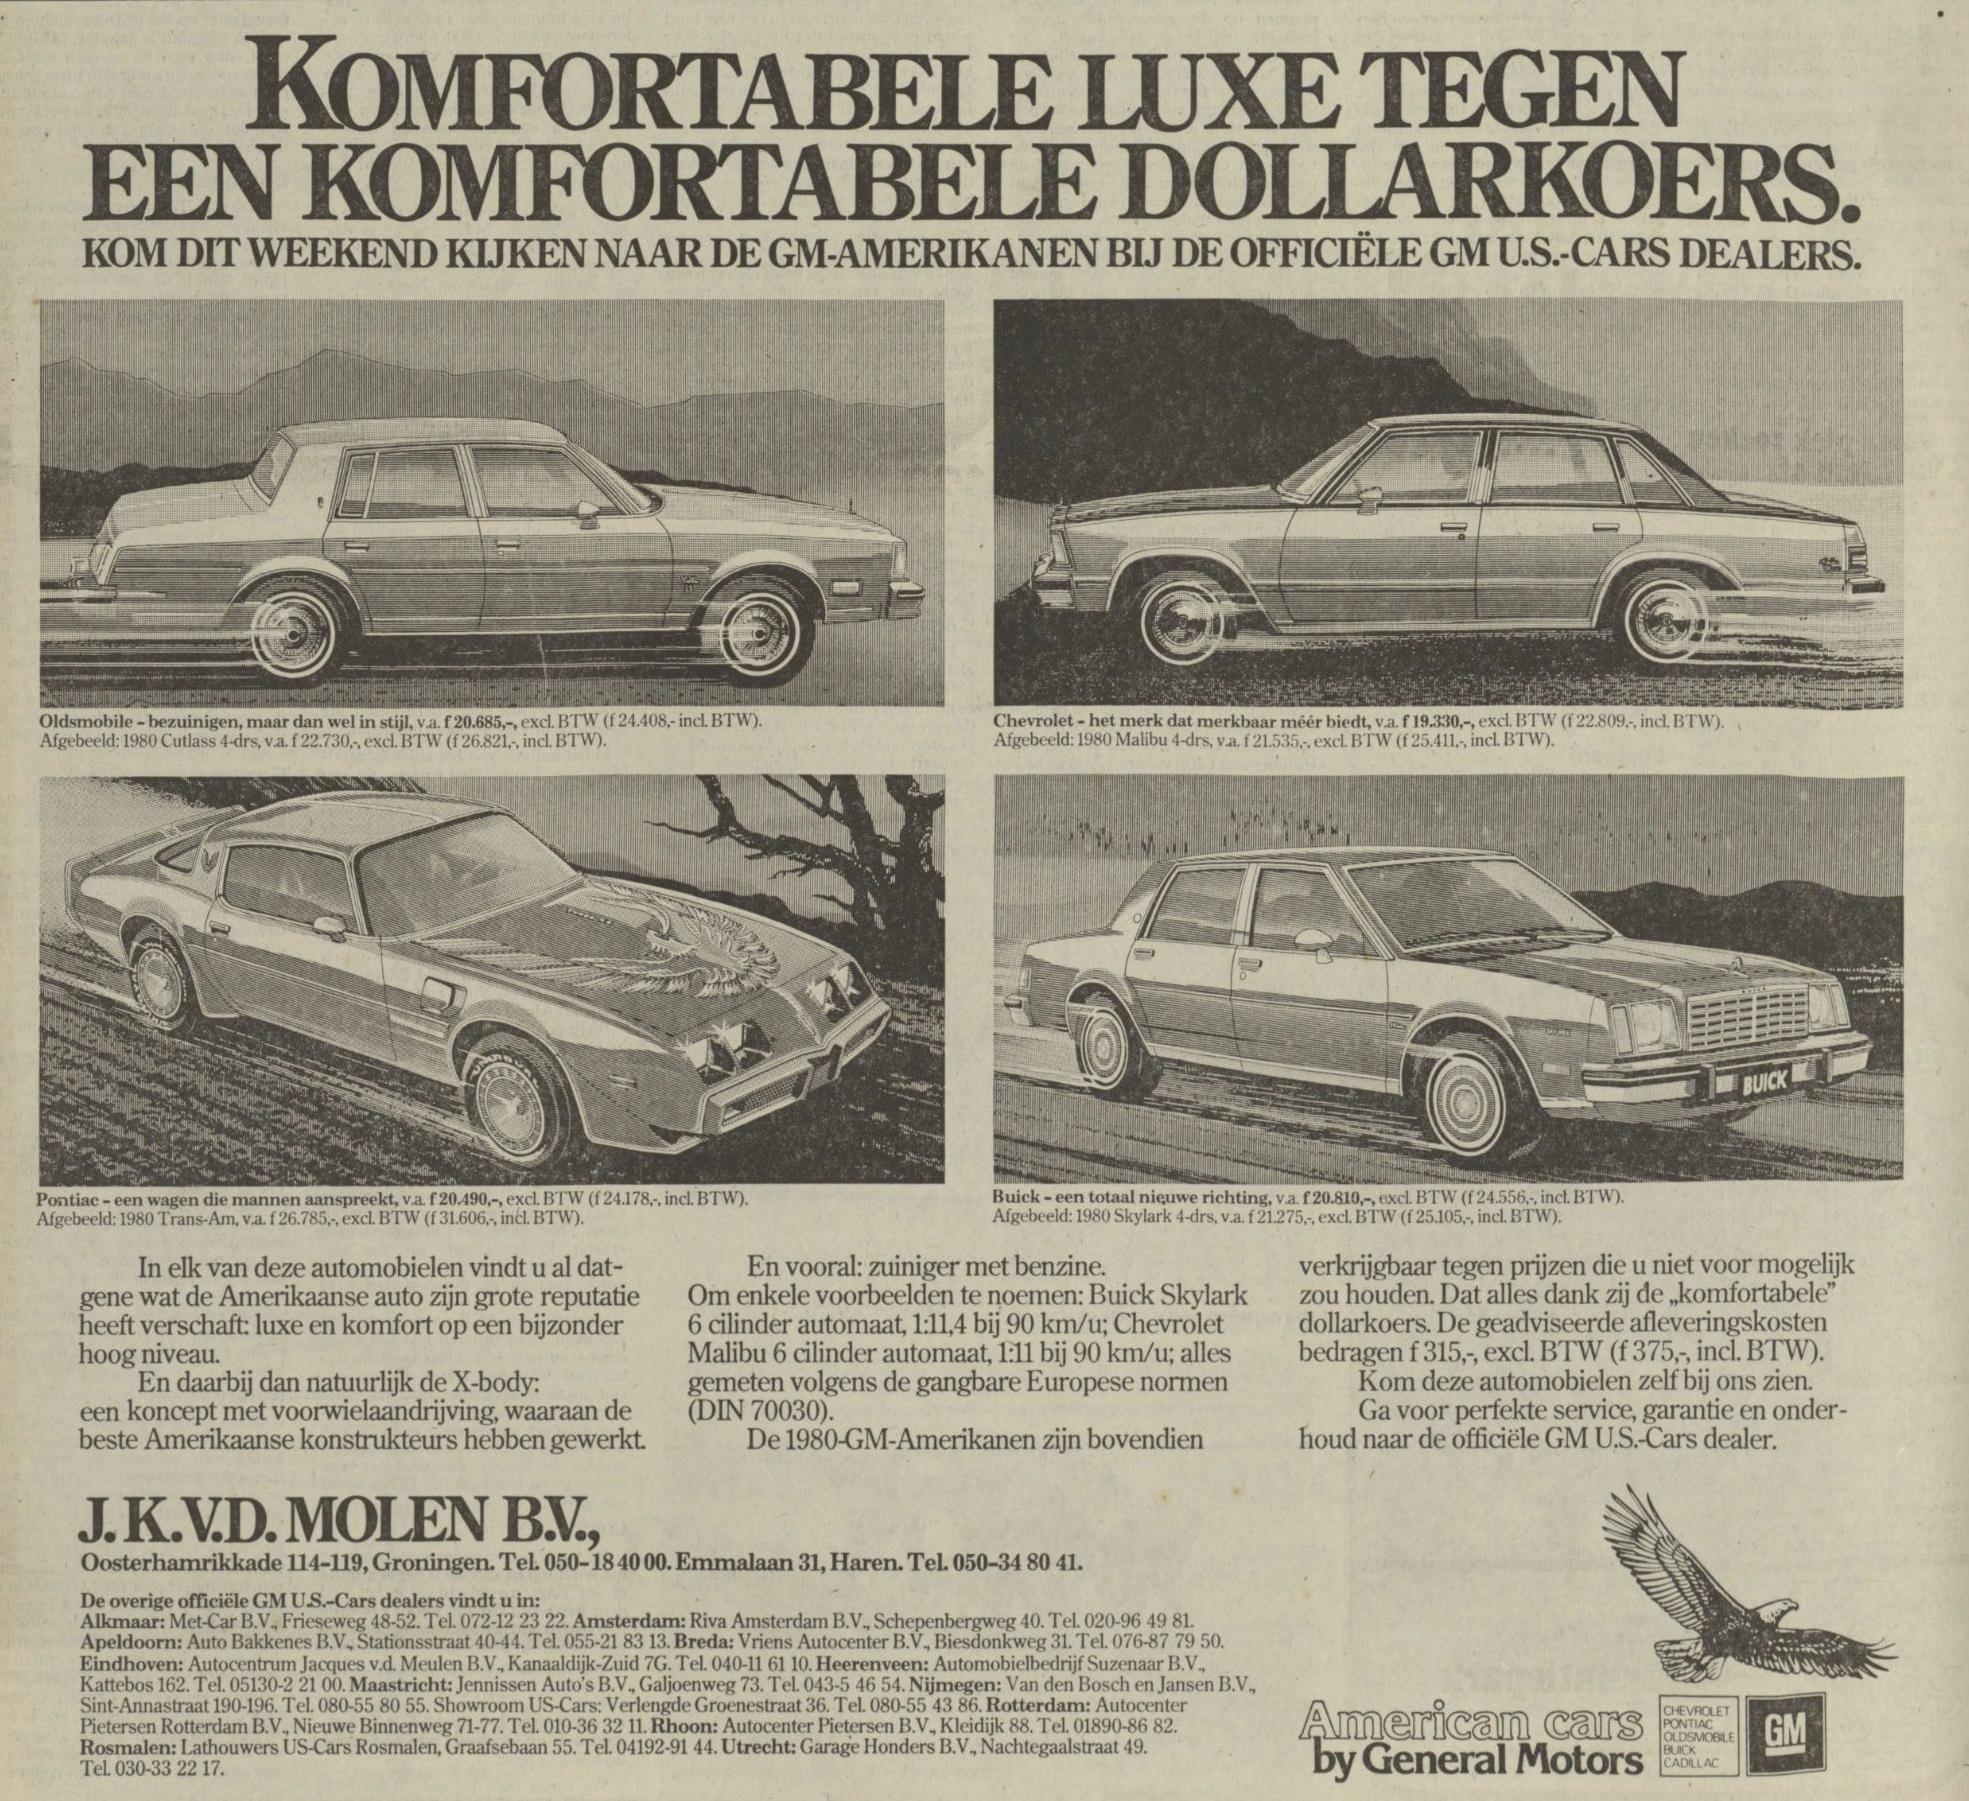 1980 GM